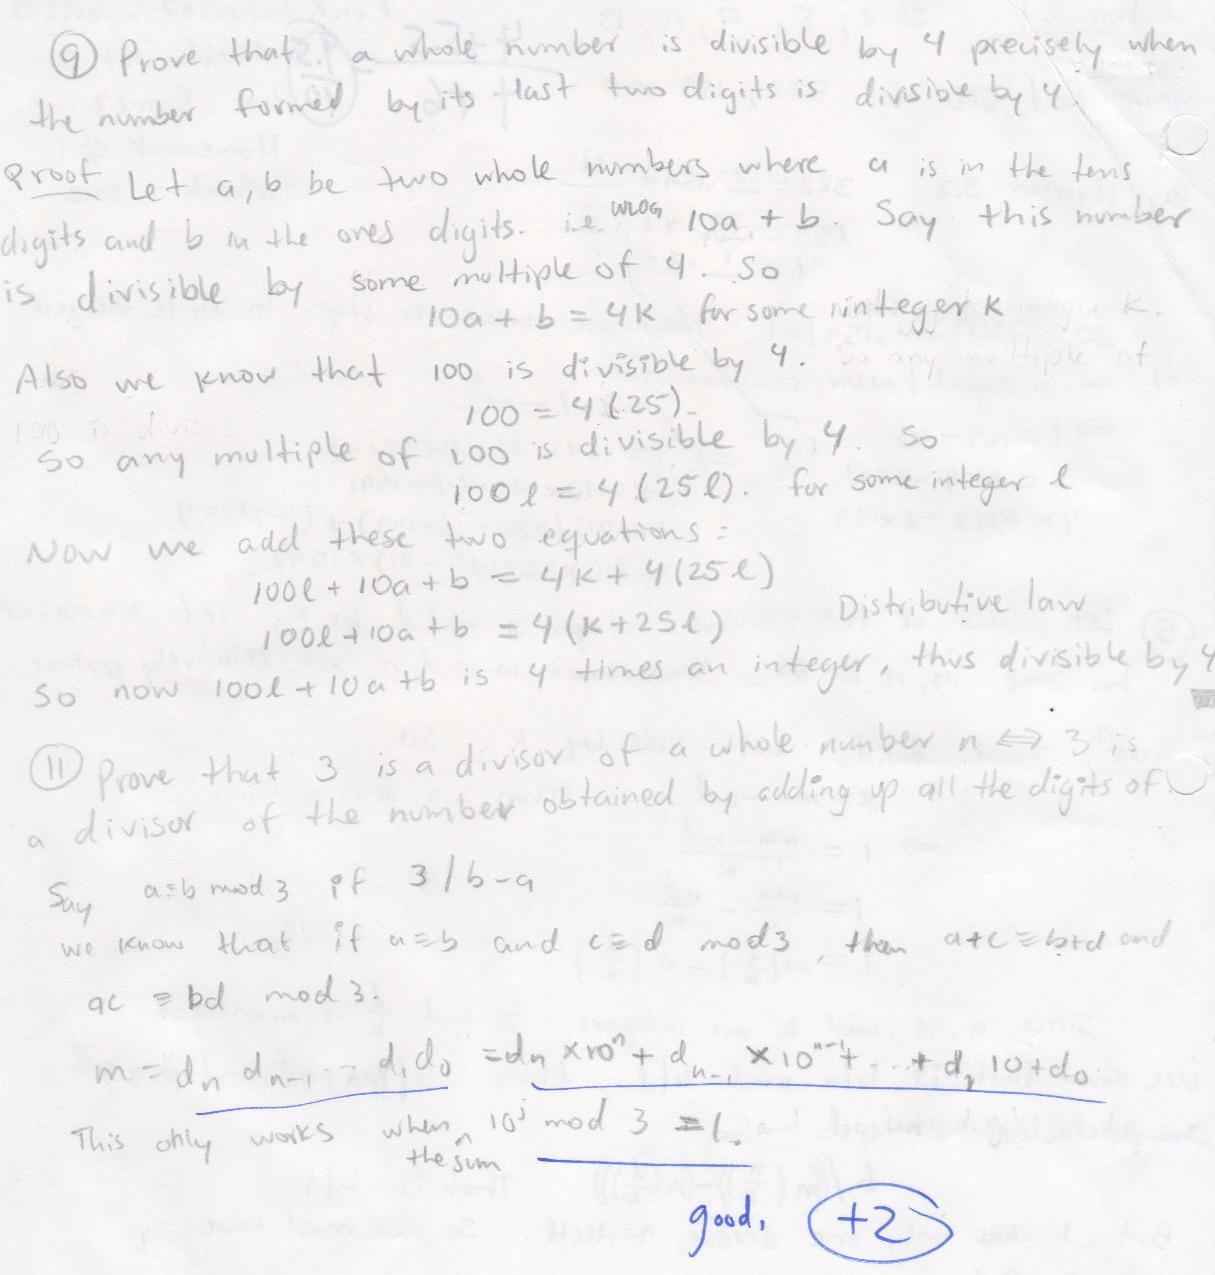 My old math homework from UC Berkeley : Math 151 hw6